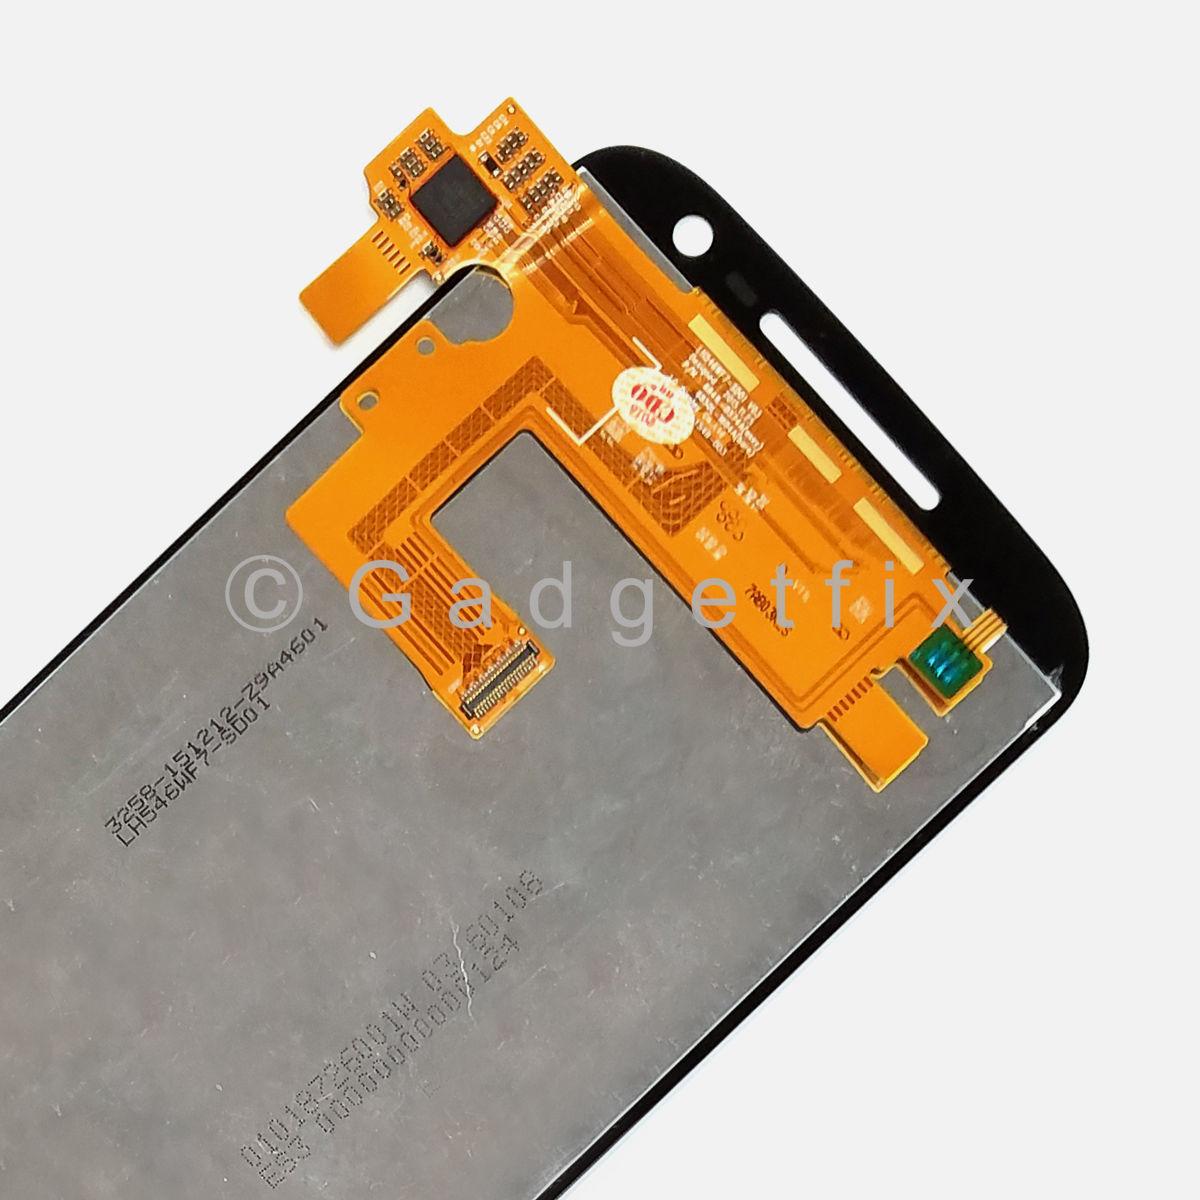 Touch Screen Digitizer Panel LCD Screen Display For Motorola Moto G4 LTE XT1625